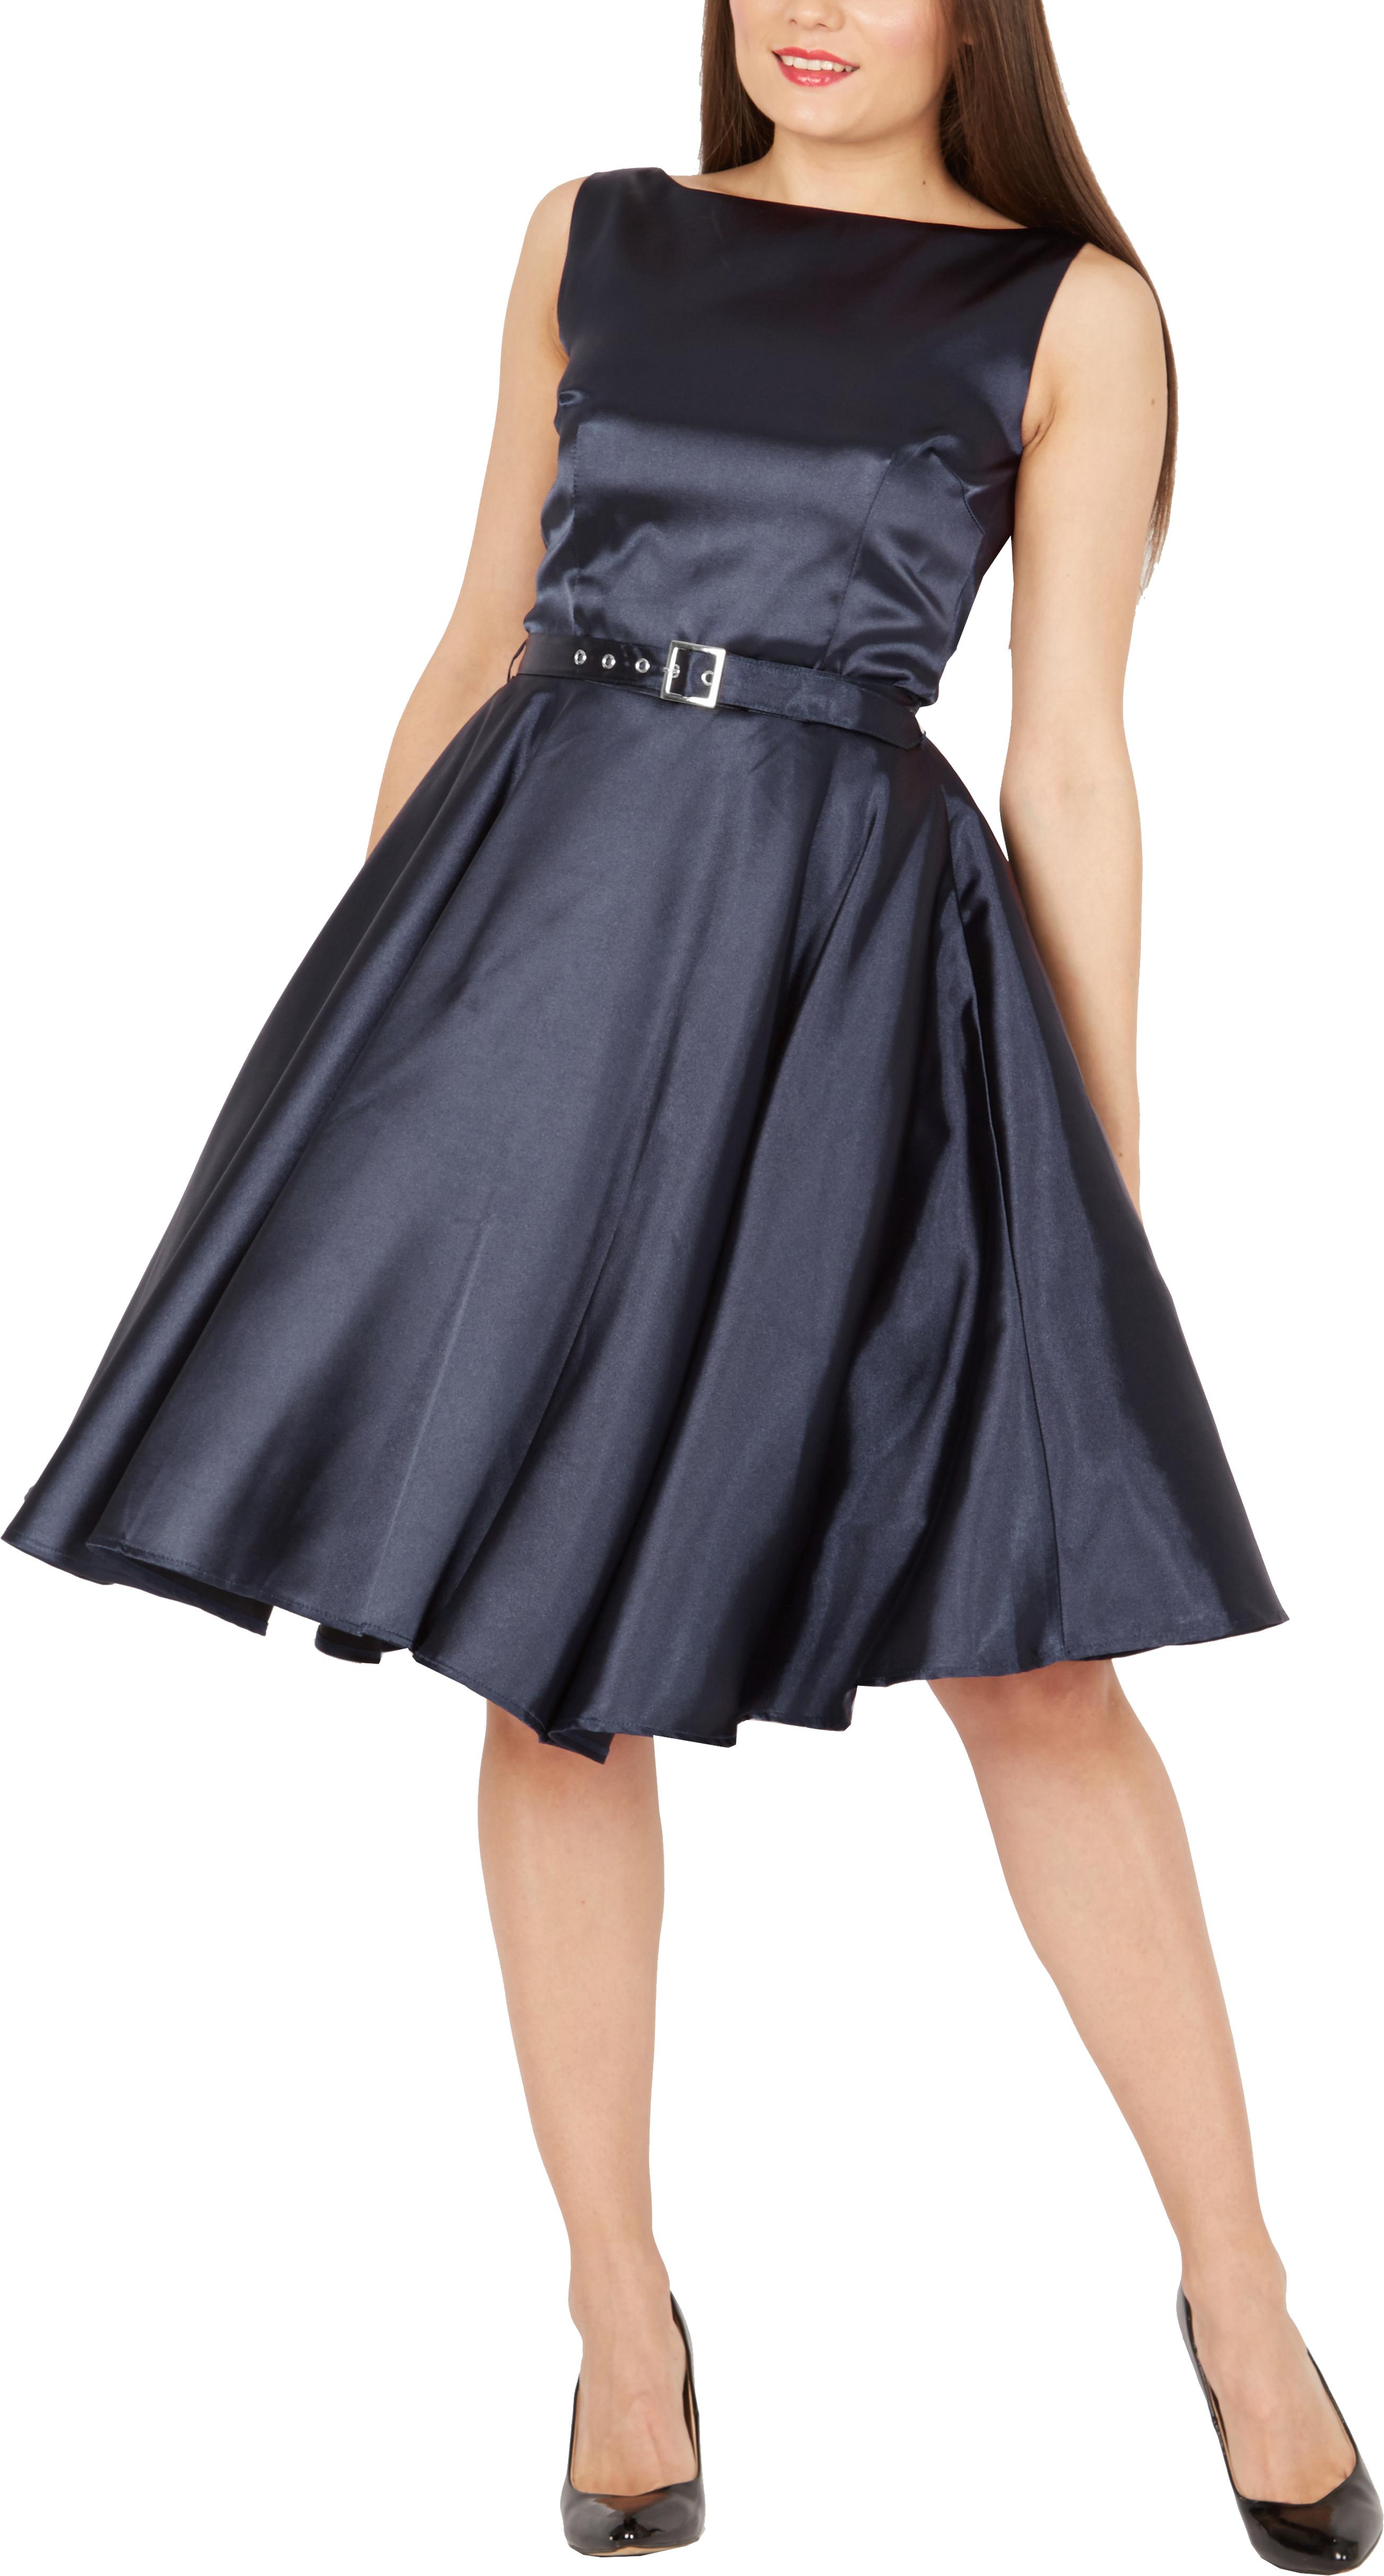 BlackButterfly-Audrey-Vintage-Satin-Clarity-Vintage-50-039-s-Rockabilly-Swing-Dress thumbnail 20